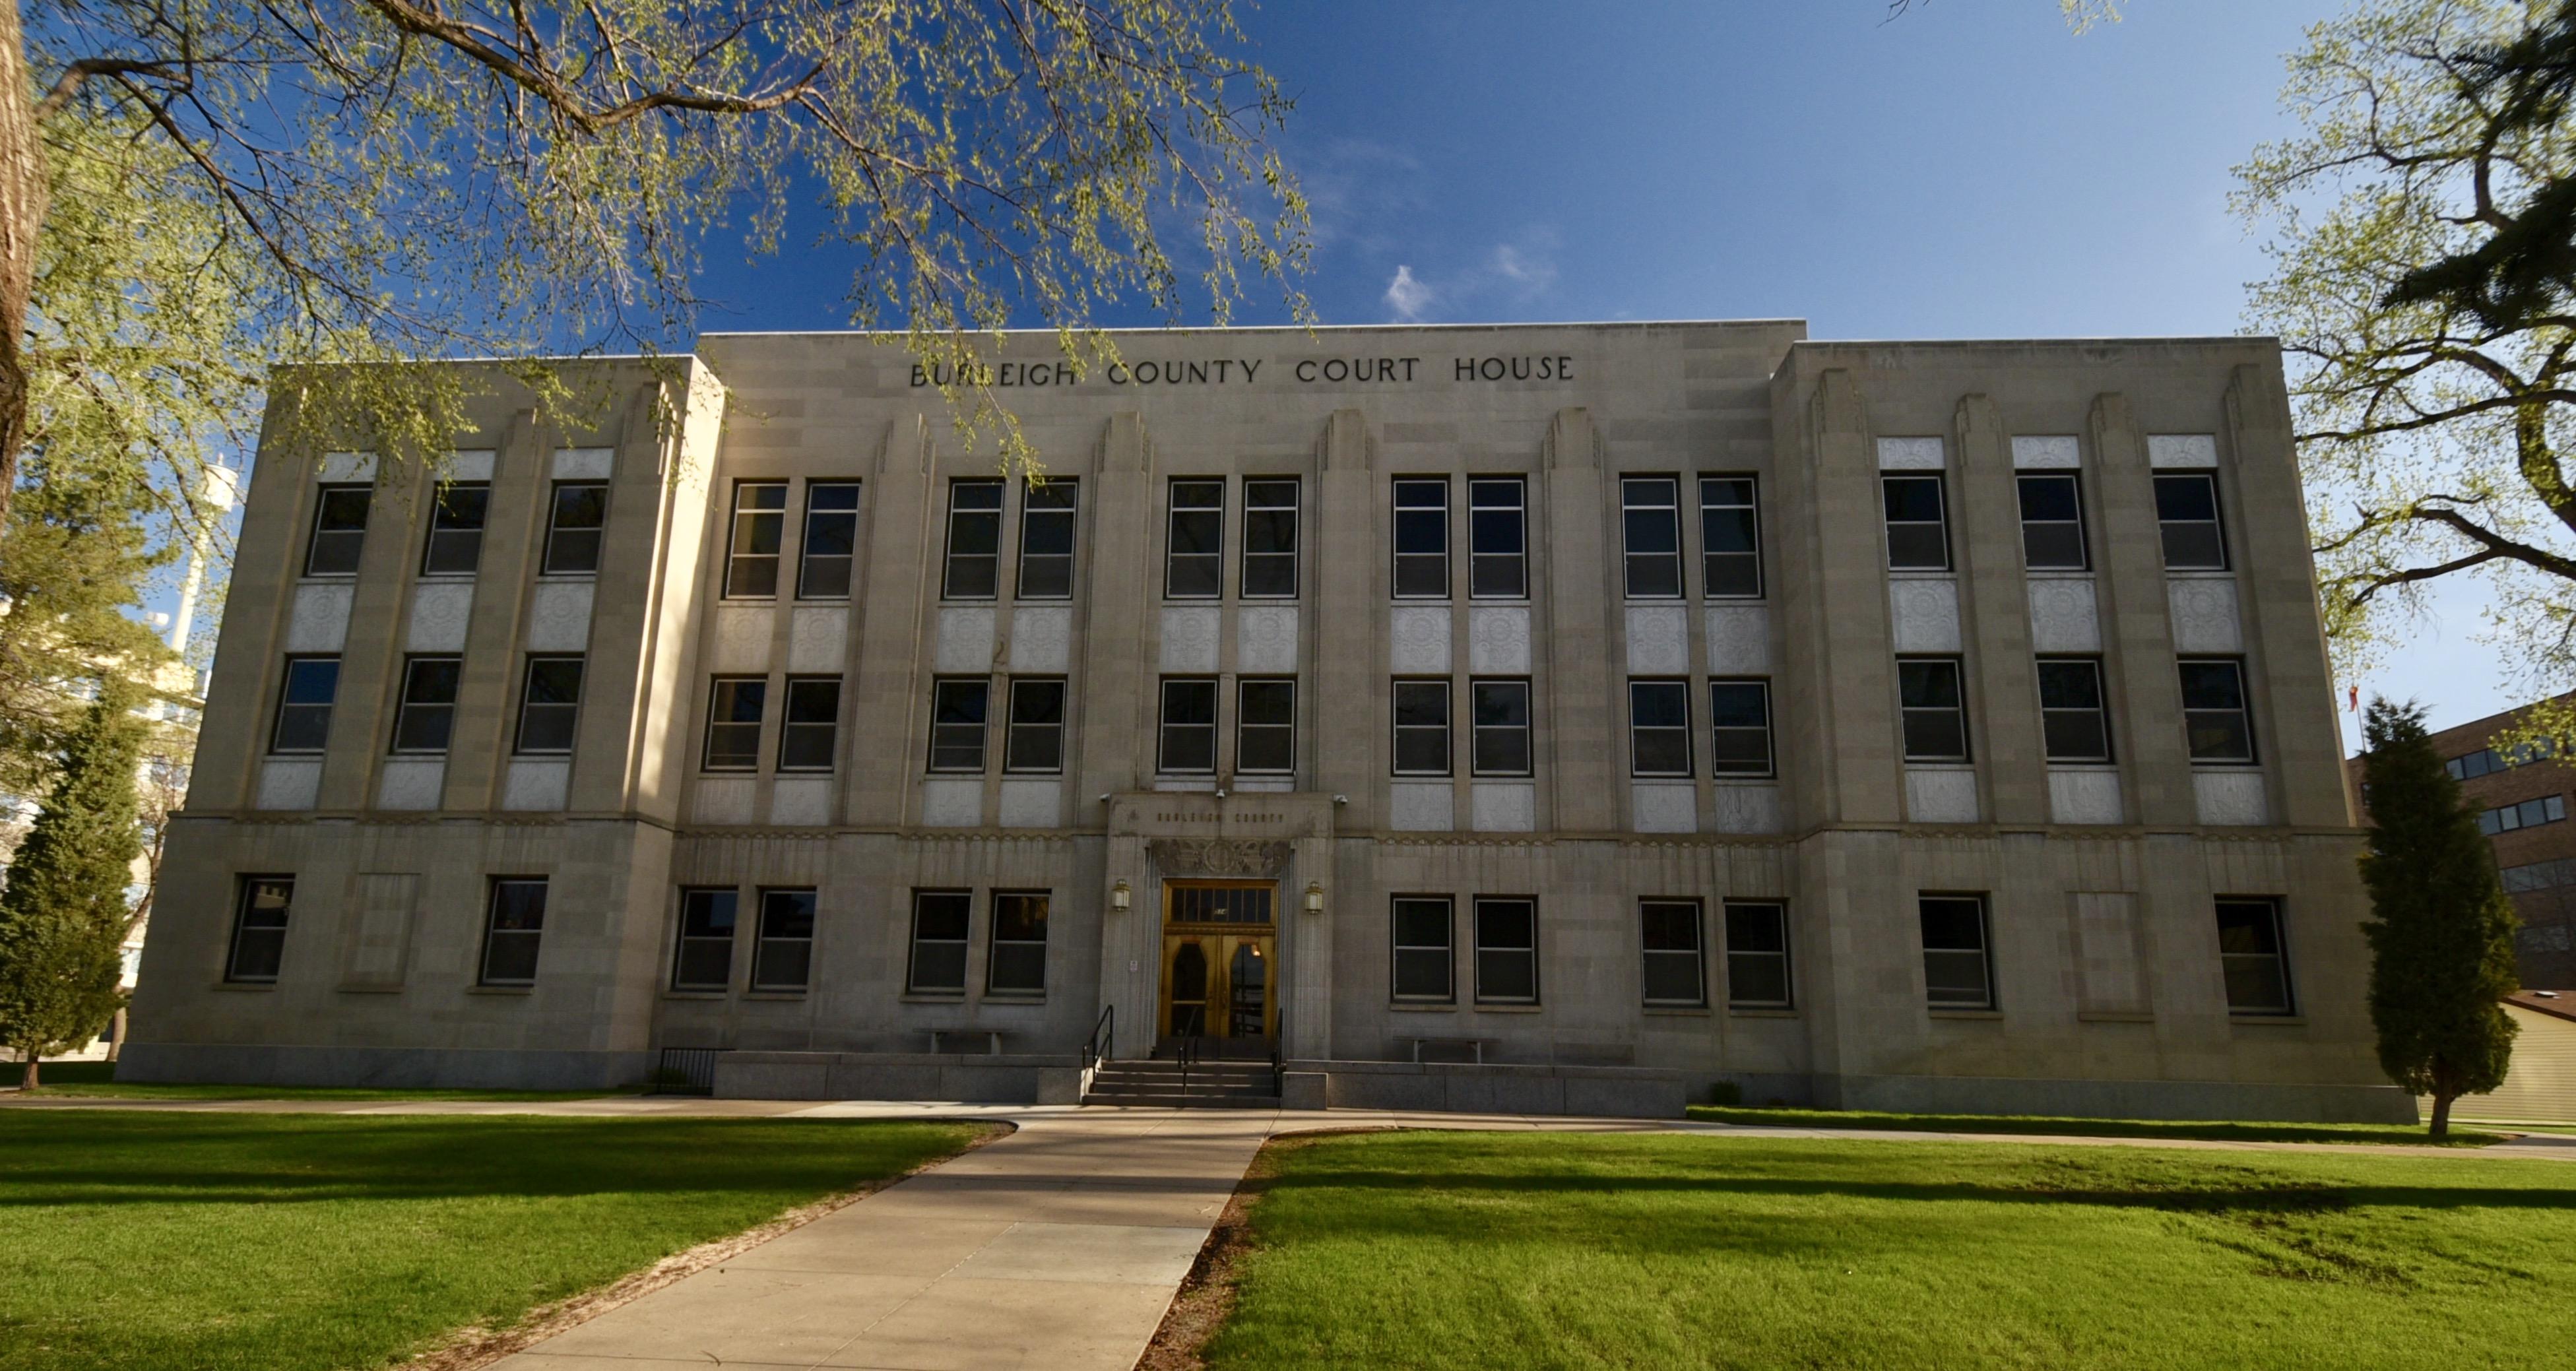 Burleigh County, North Dakota - Wikipedia